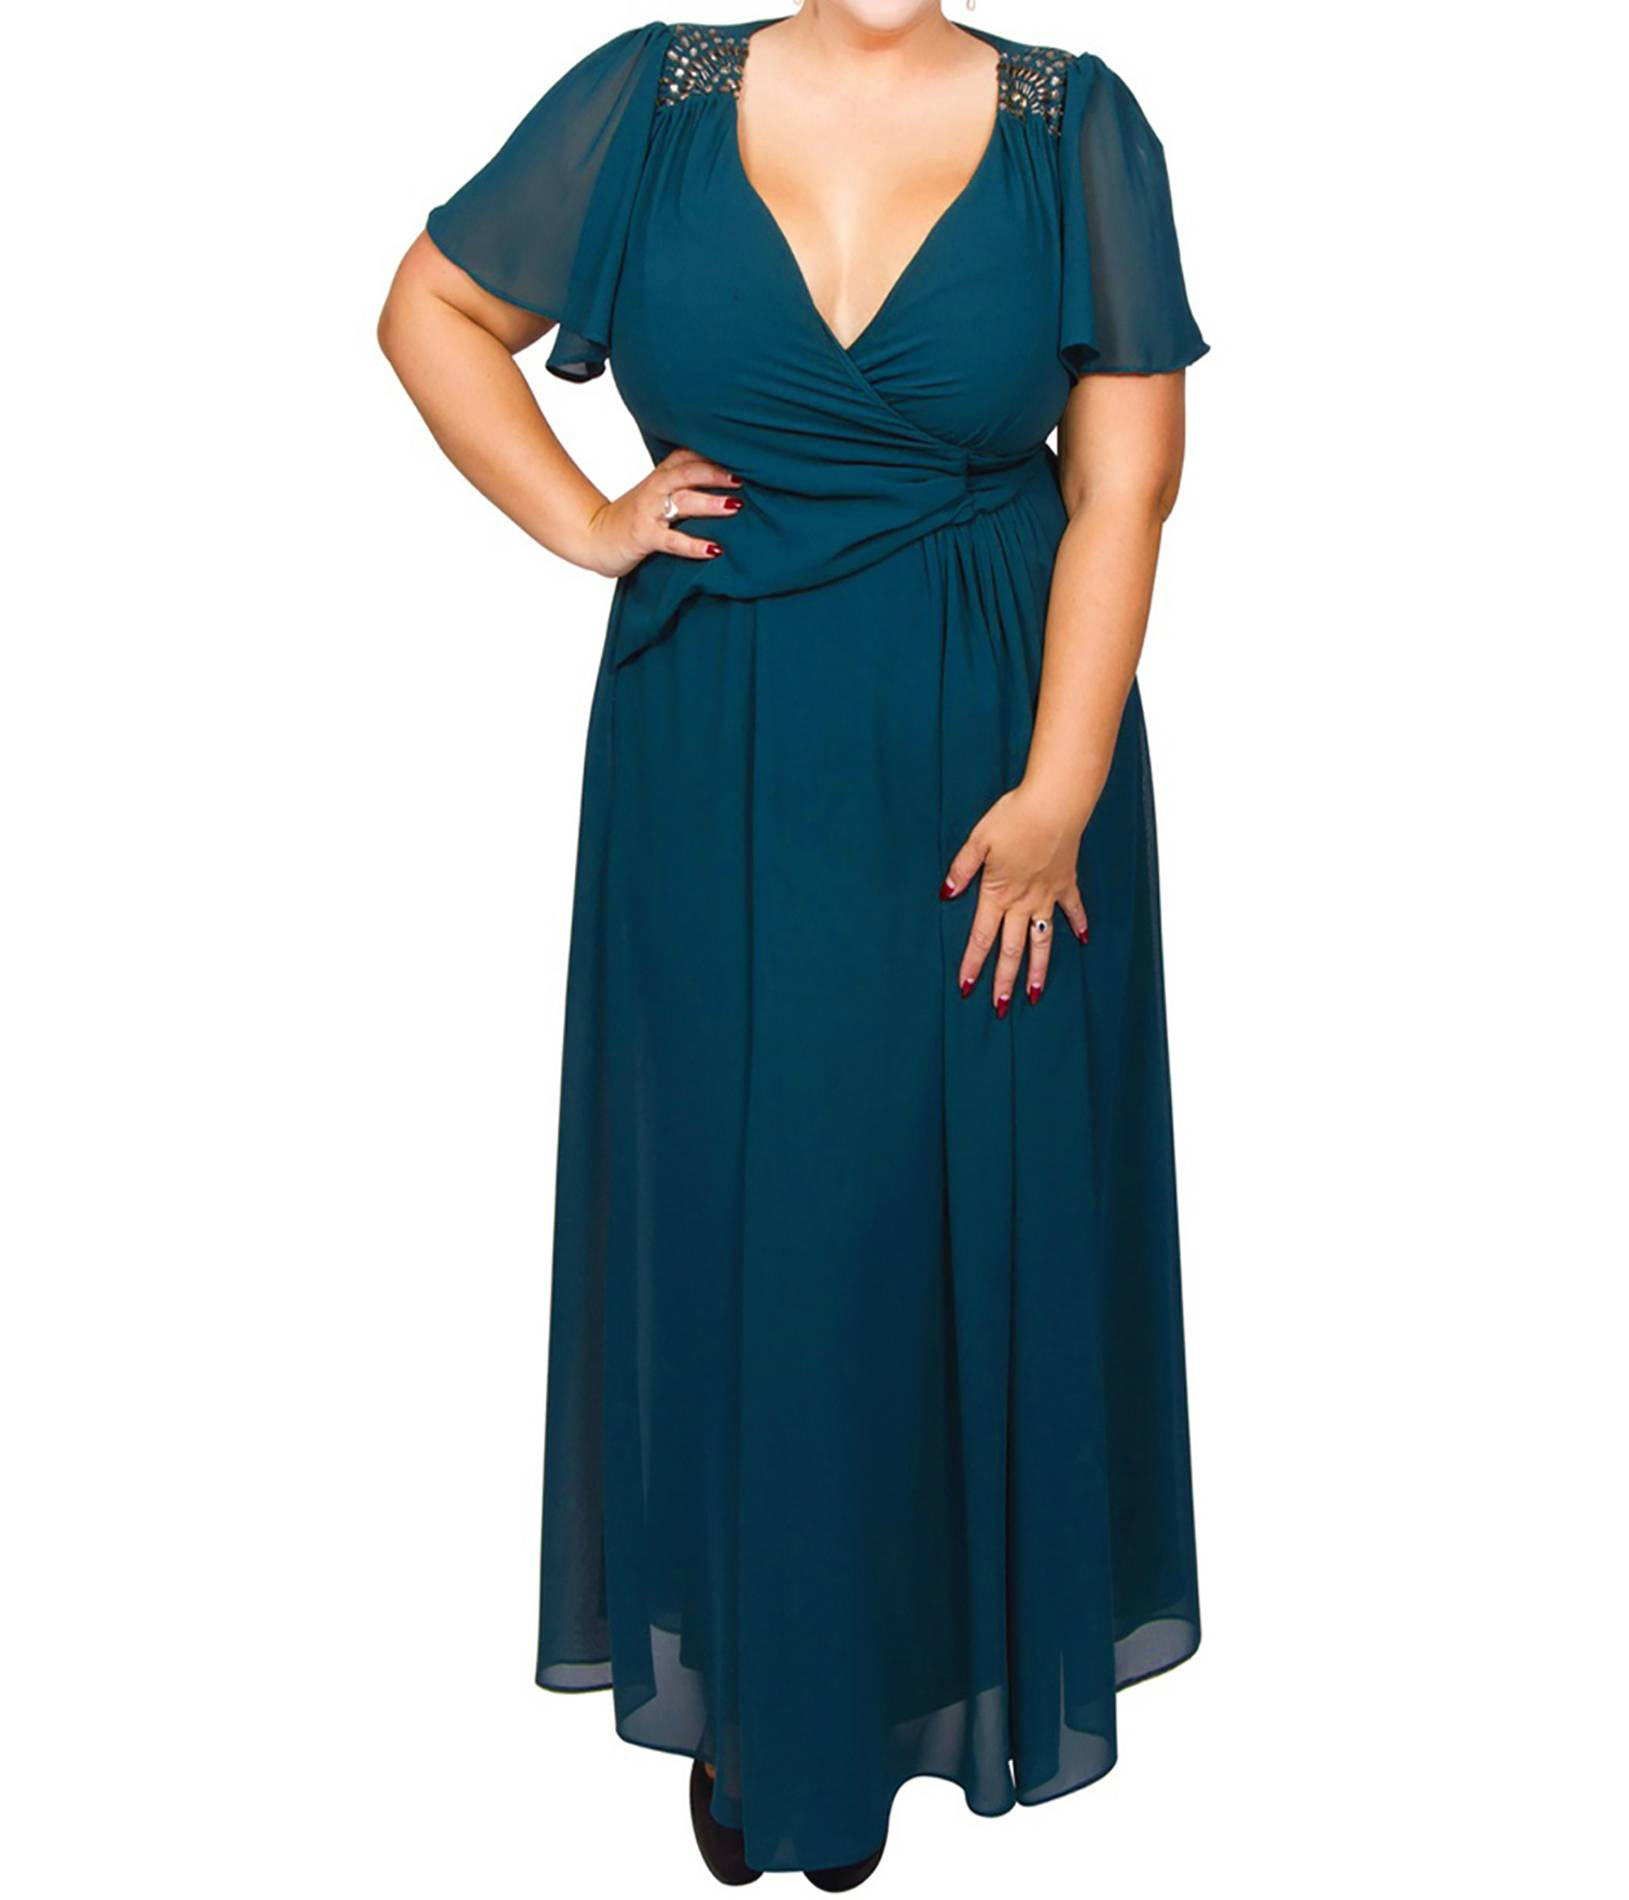 f9827f7f724 ΜΕΓΑΛΑ ΜΕΓΕΘΗ ΦΟΡΕΜΑΤΑ :: Φόρεμα Μάξι Πετρόλ Μουσελίνα - Μόδα σε ...